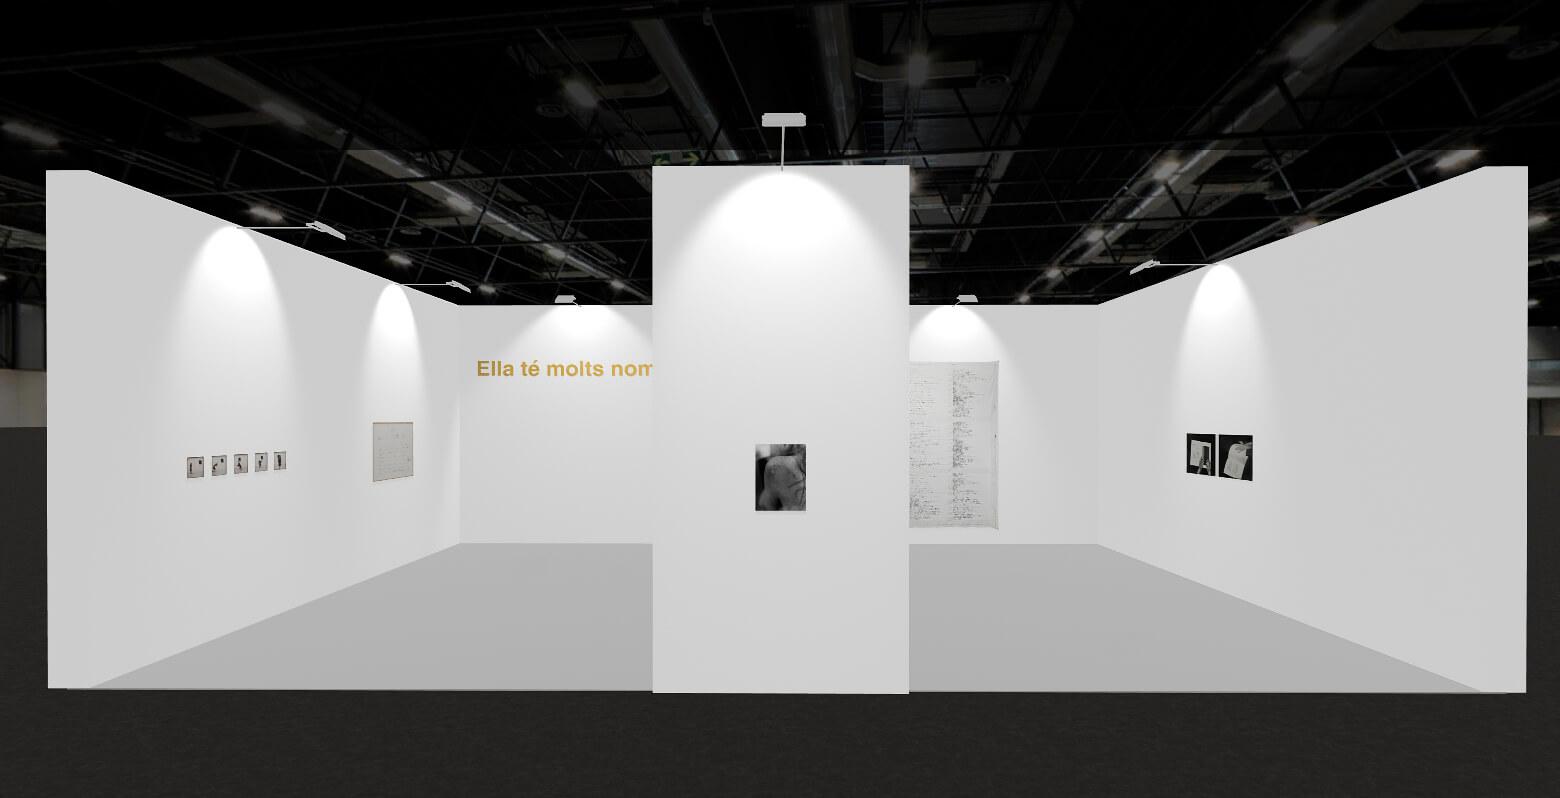 View of virtual 3D booth, ProjecteSD, 2021 | E-ARCO EXHIBITIONS. PRESENTATION # 1: SHE HAS MANY NAMES | ProjecteSD